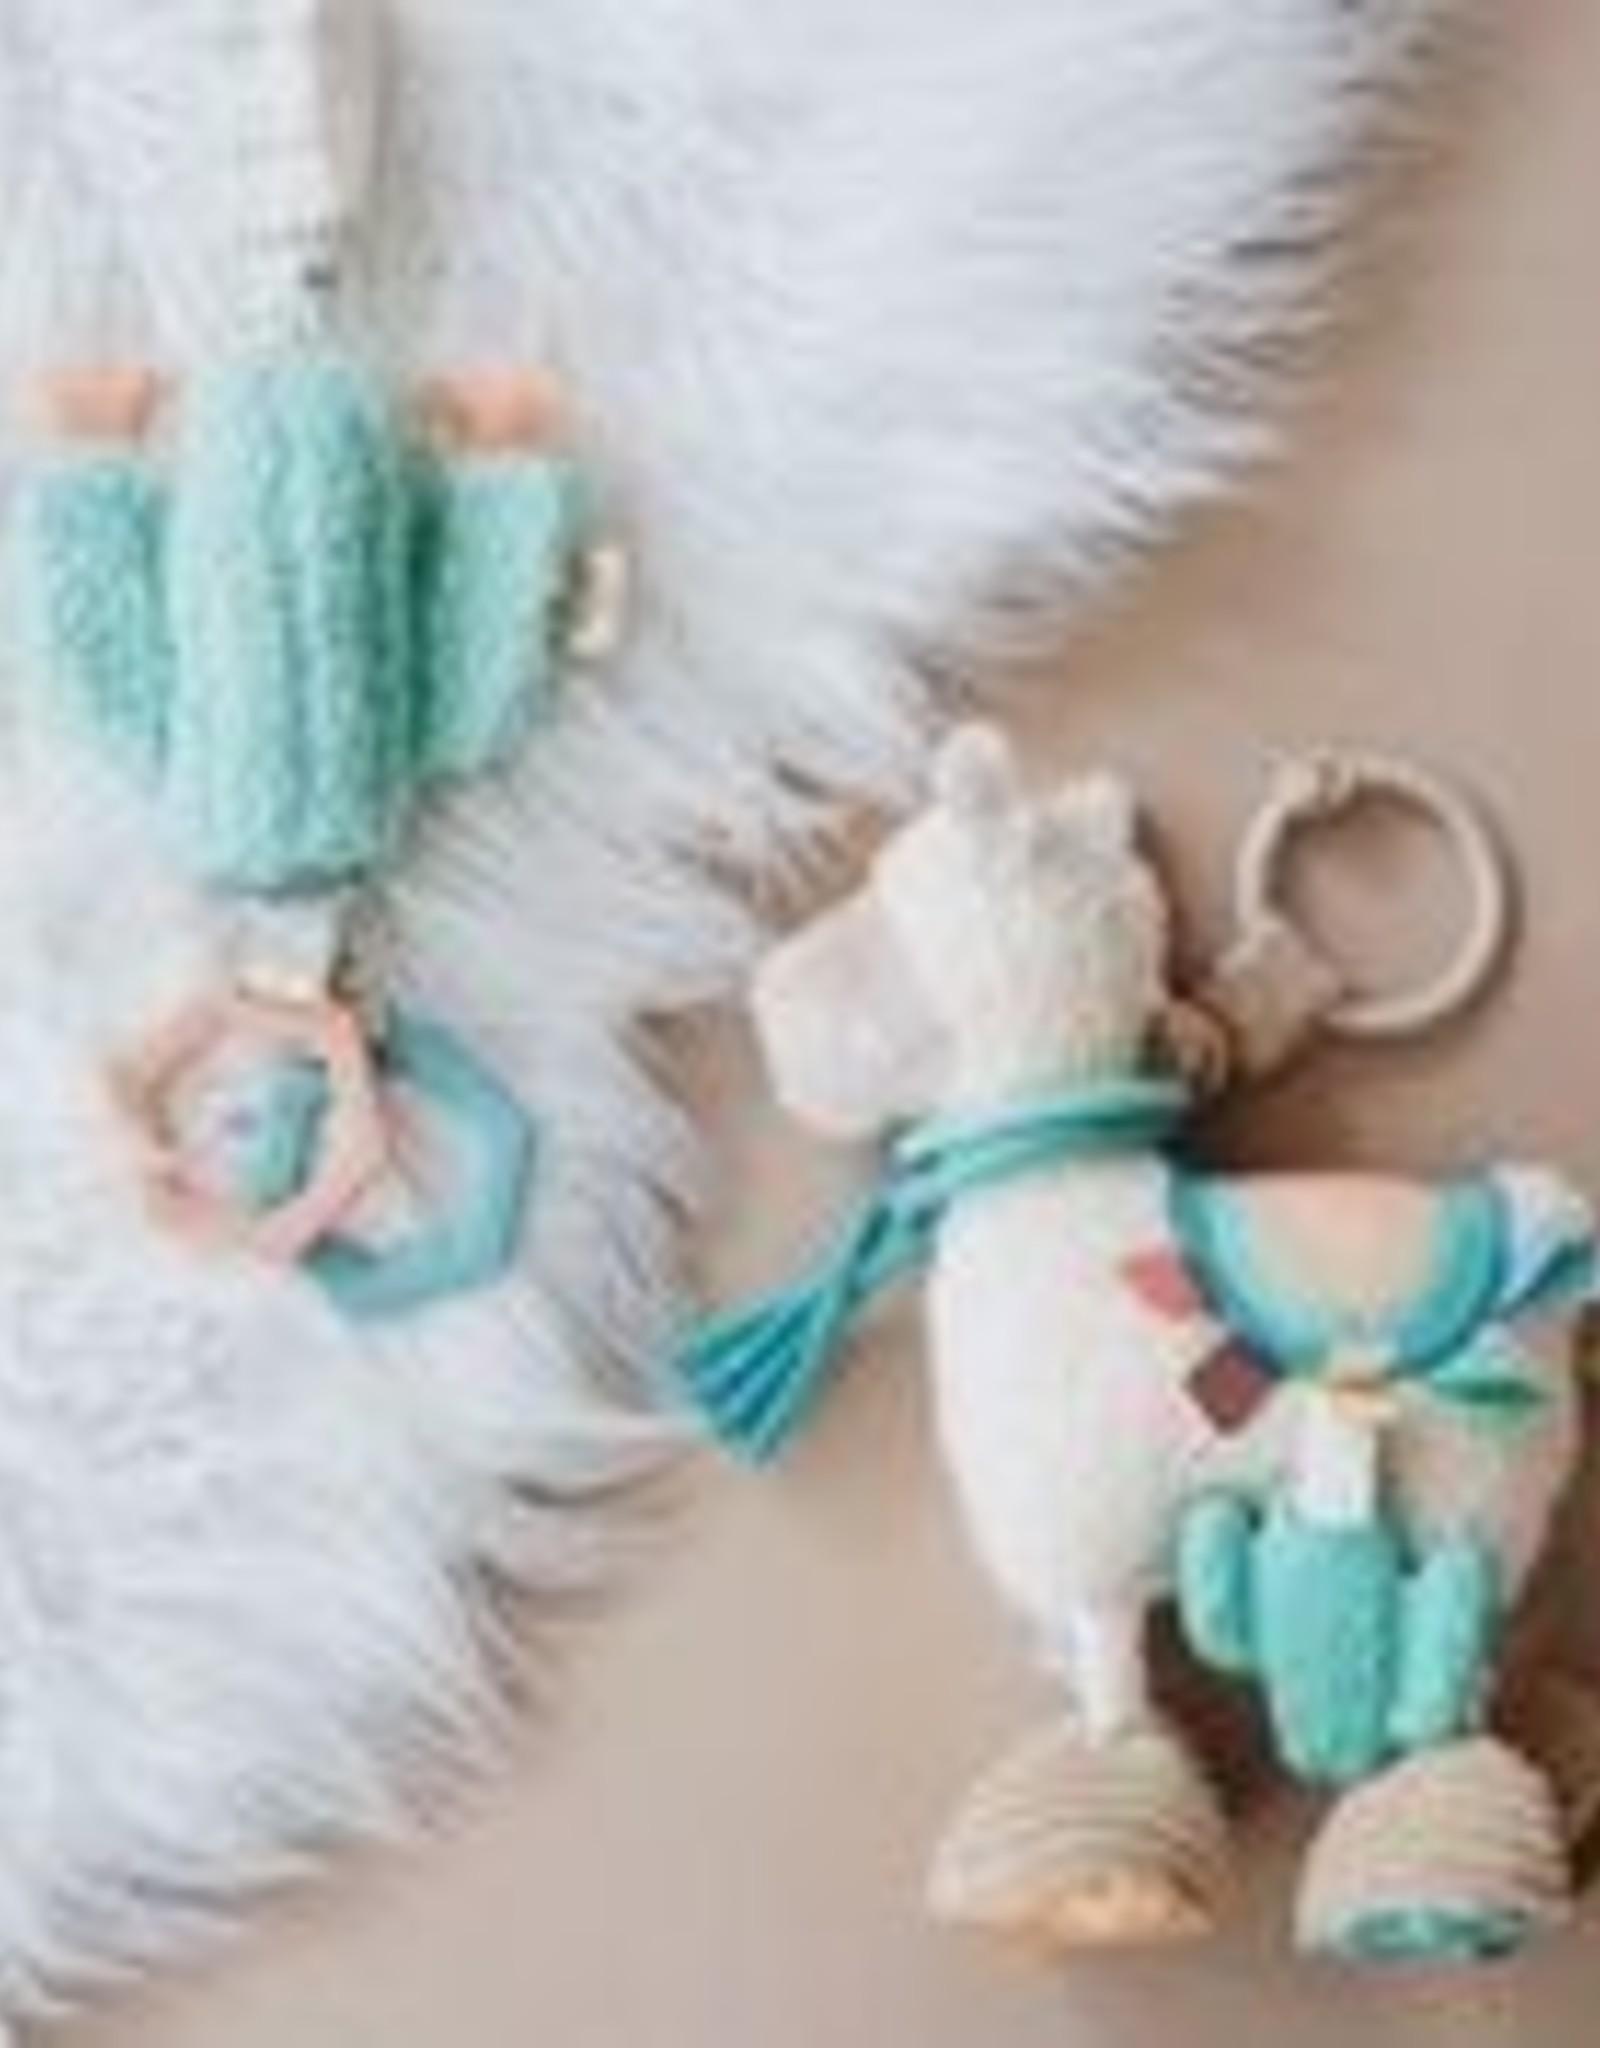 Itzy Ritzy Link & Love Llama Activity Plush Silicone Teether